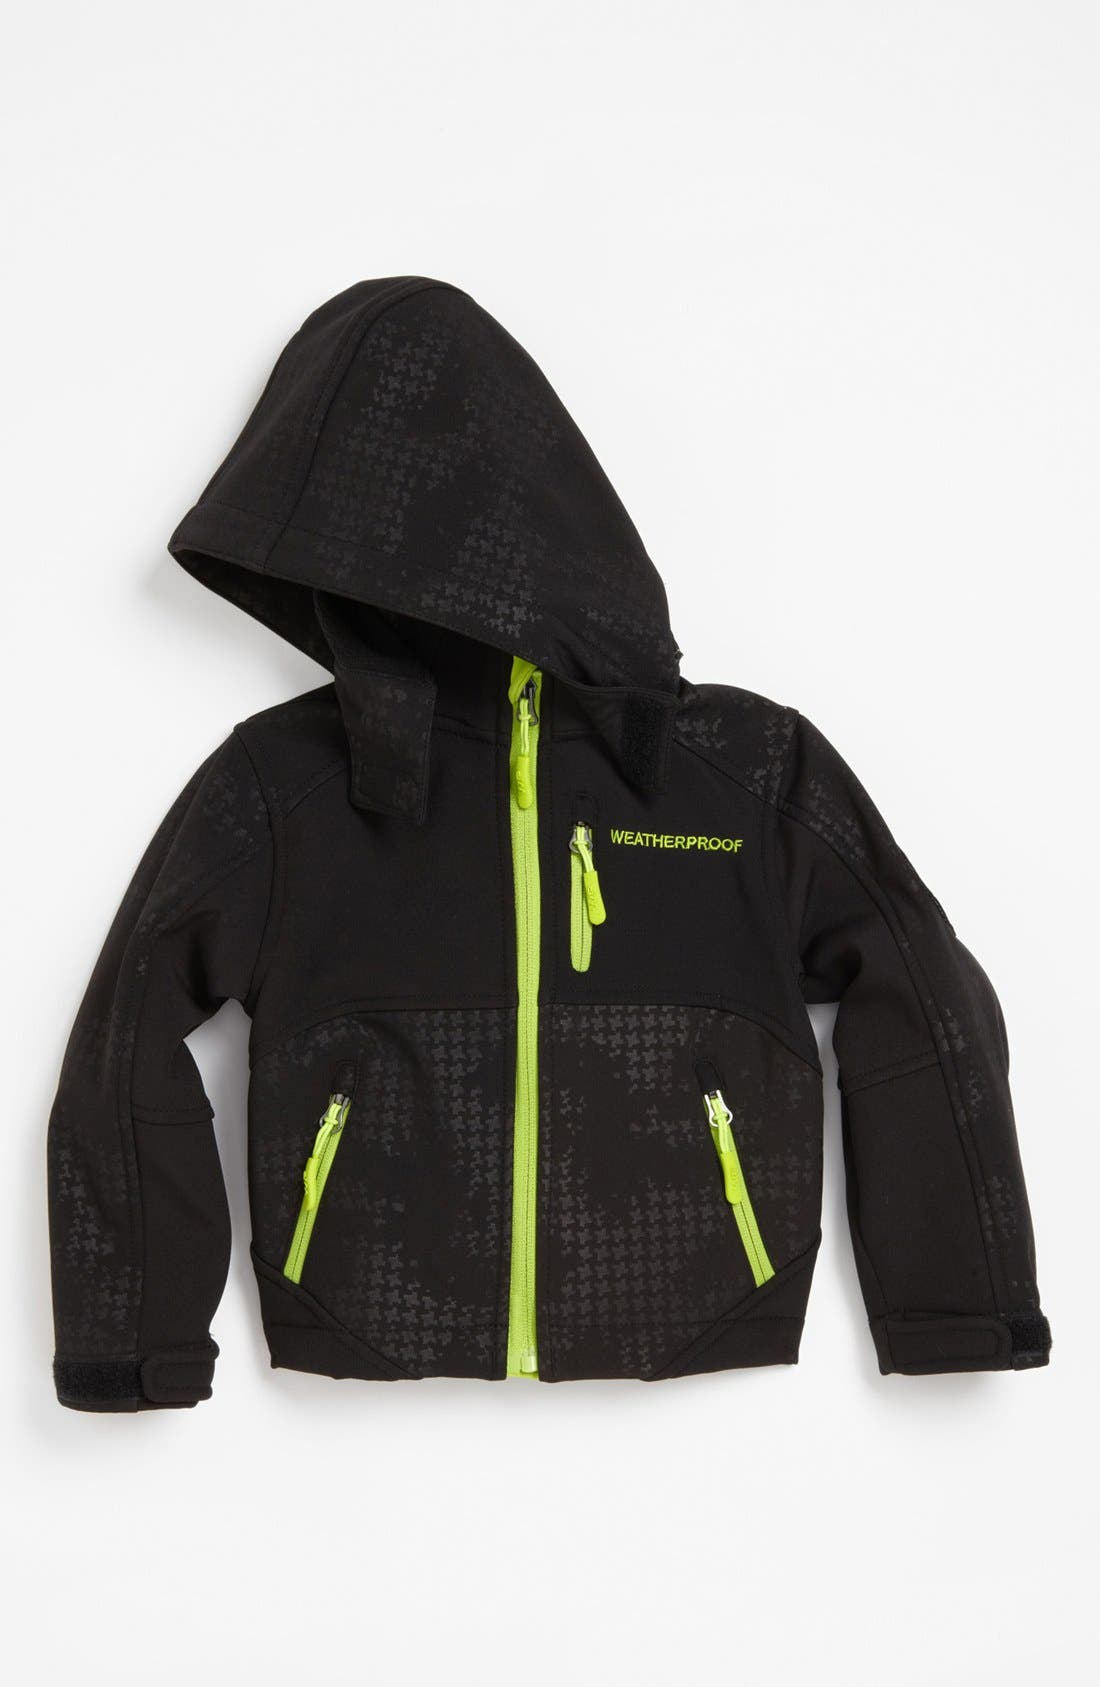 Alternate Image 1 Selected - Weatherproof® Shell Jacket (Toddler Boys)